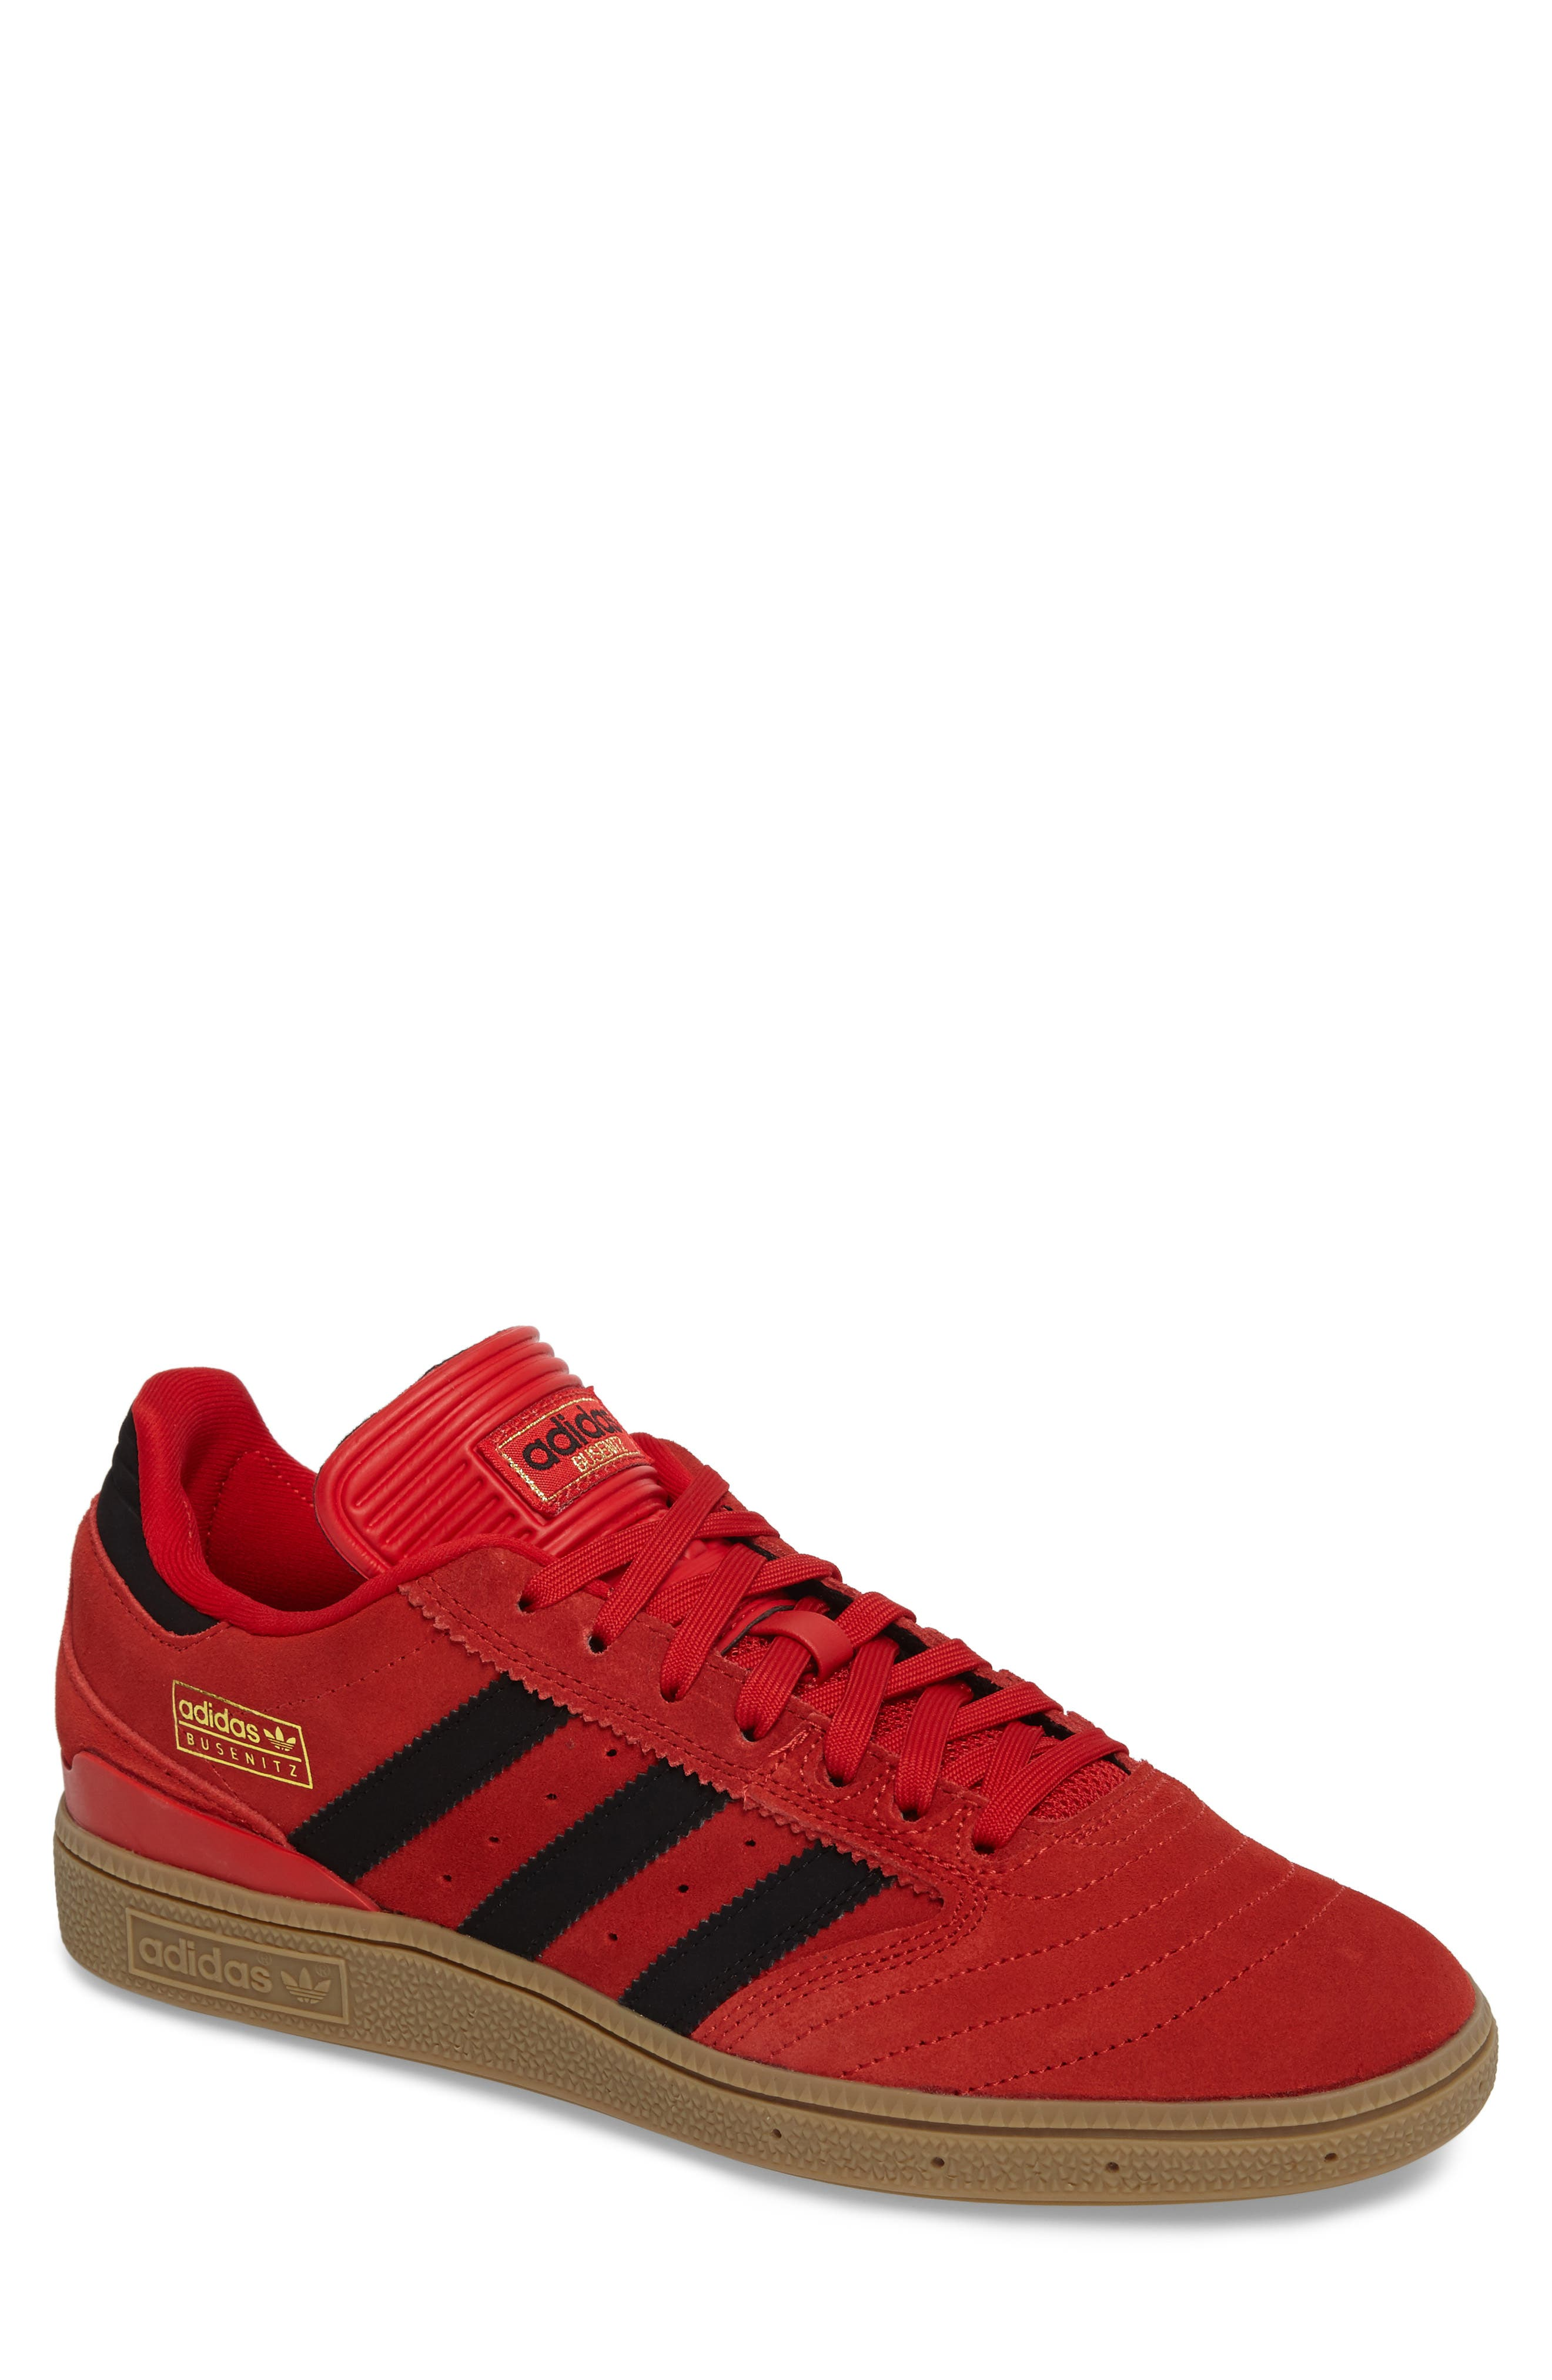 Busenitz Sneaker,                             Main thumbnail 1, color,                             Scarlet/ Core Black/ Gum4